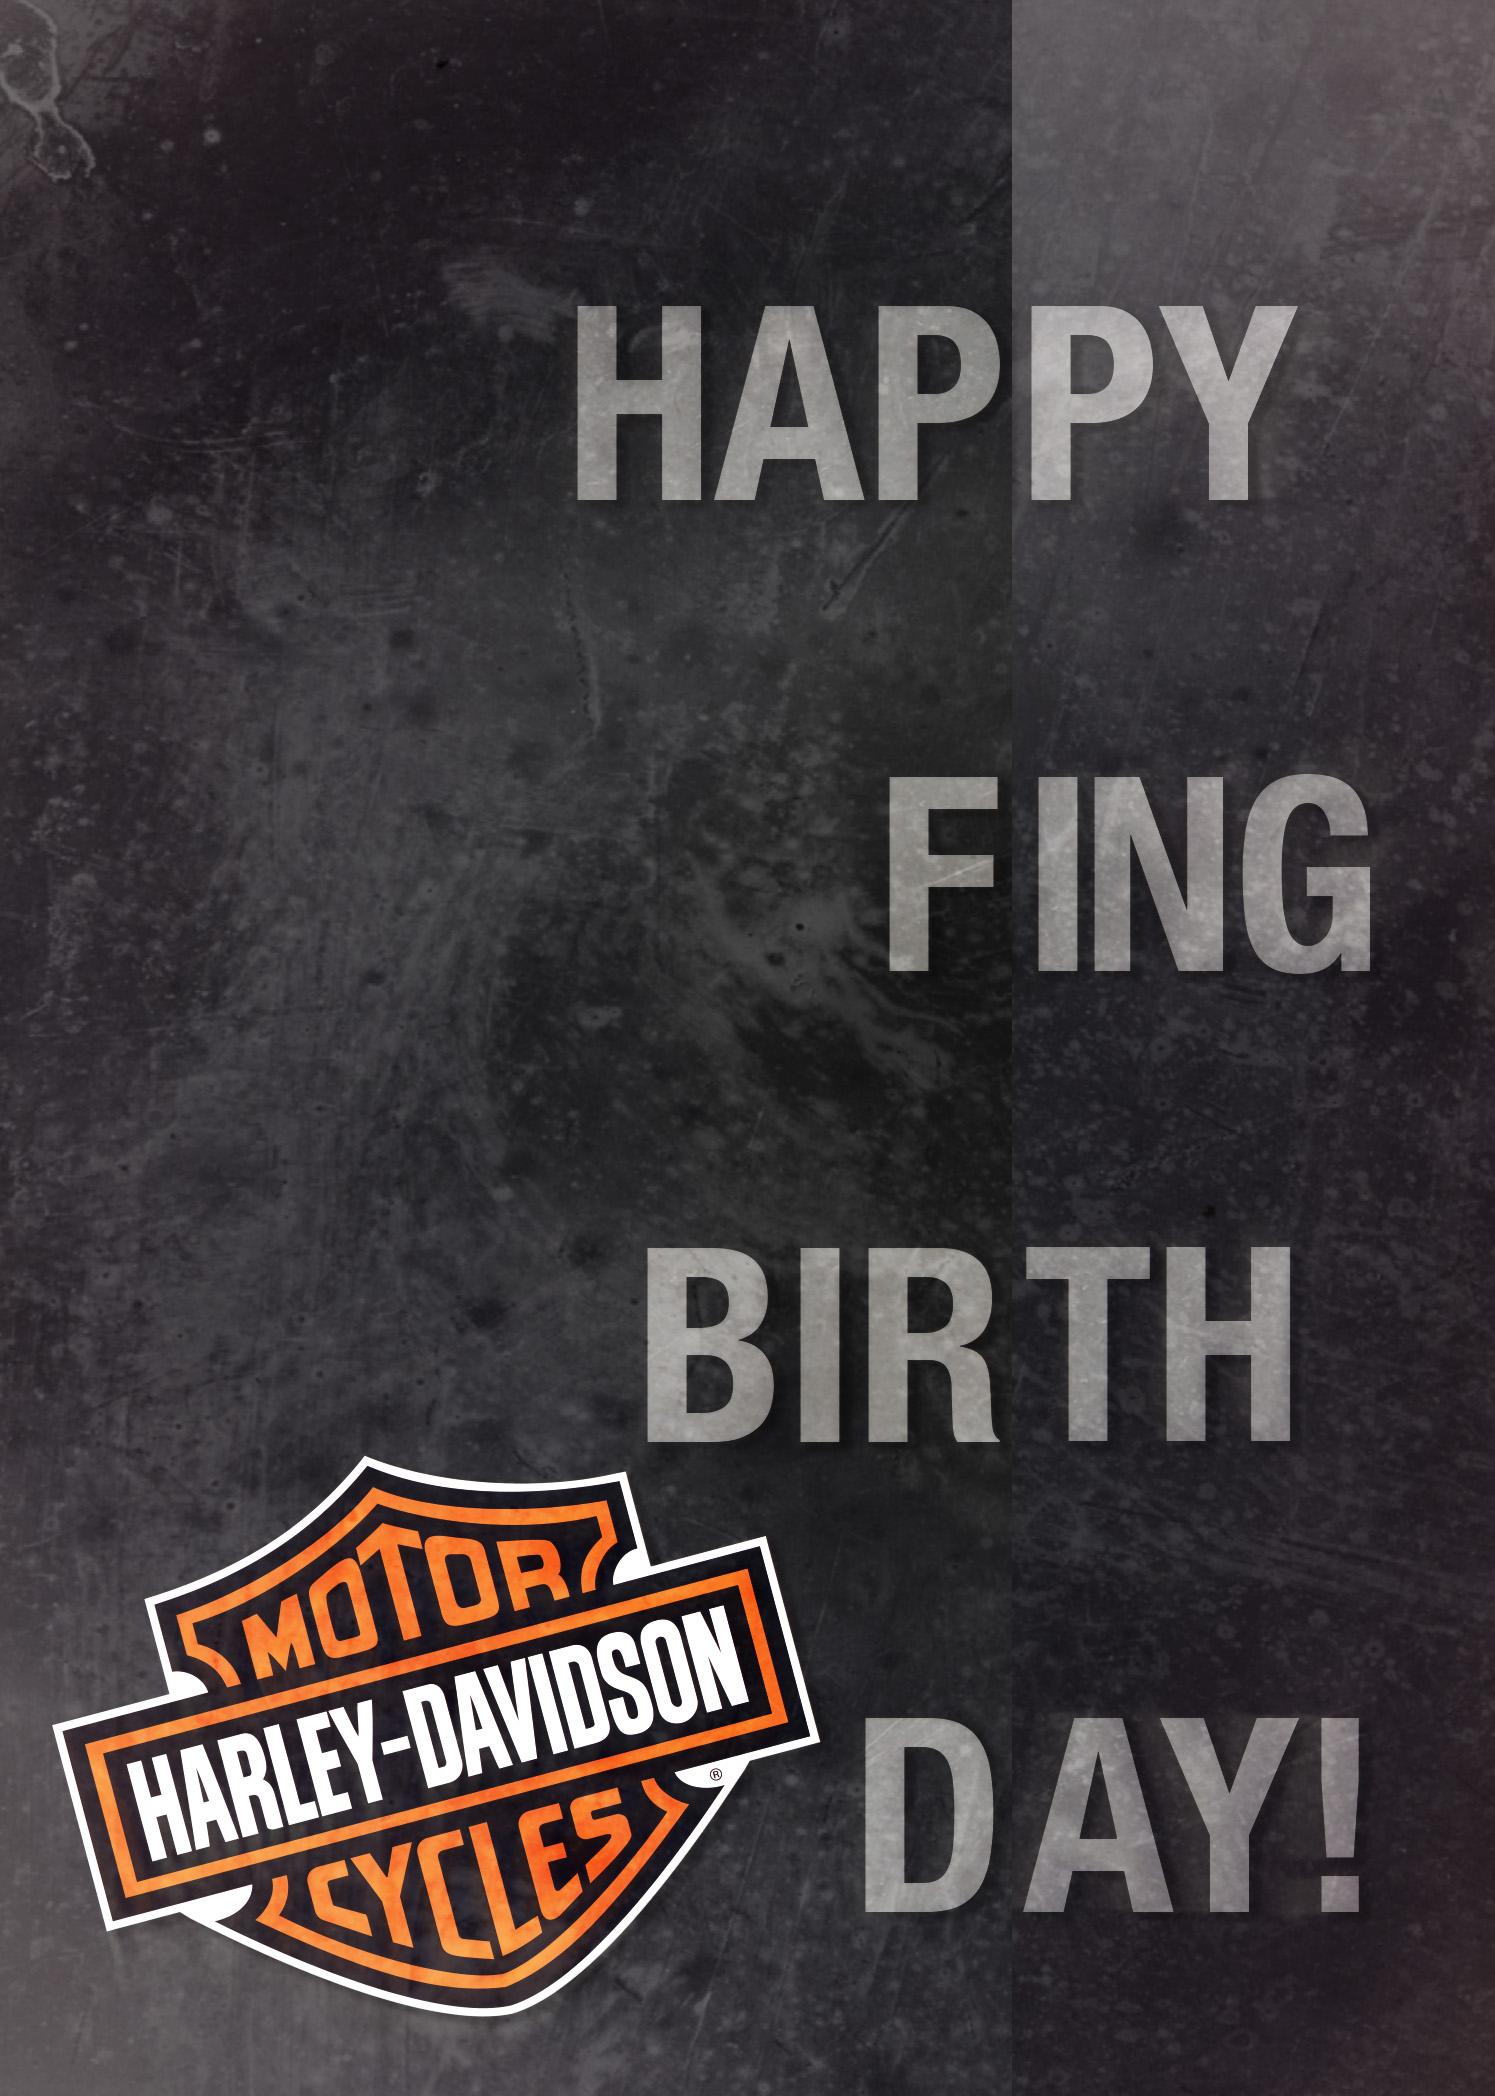 Harley Davidson Happy Fing Birthday Card – Harley Davidson Birthday Cards